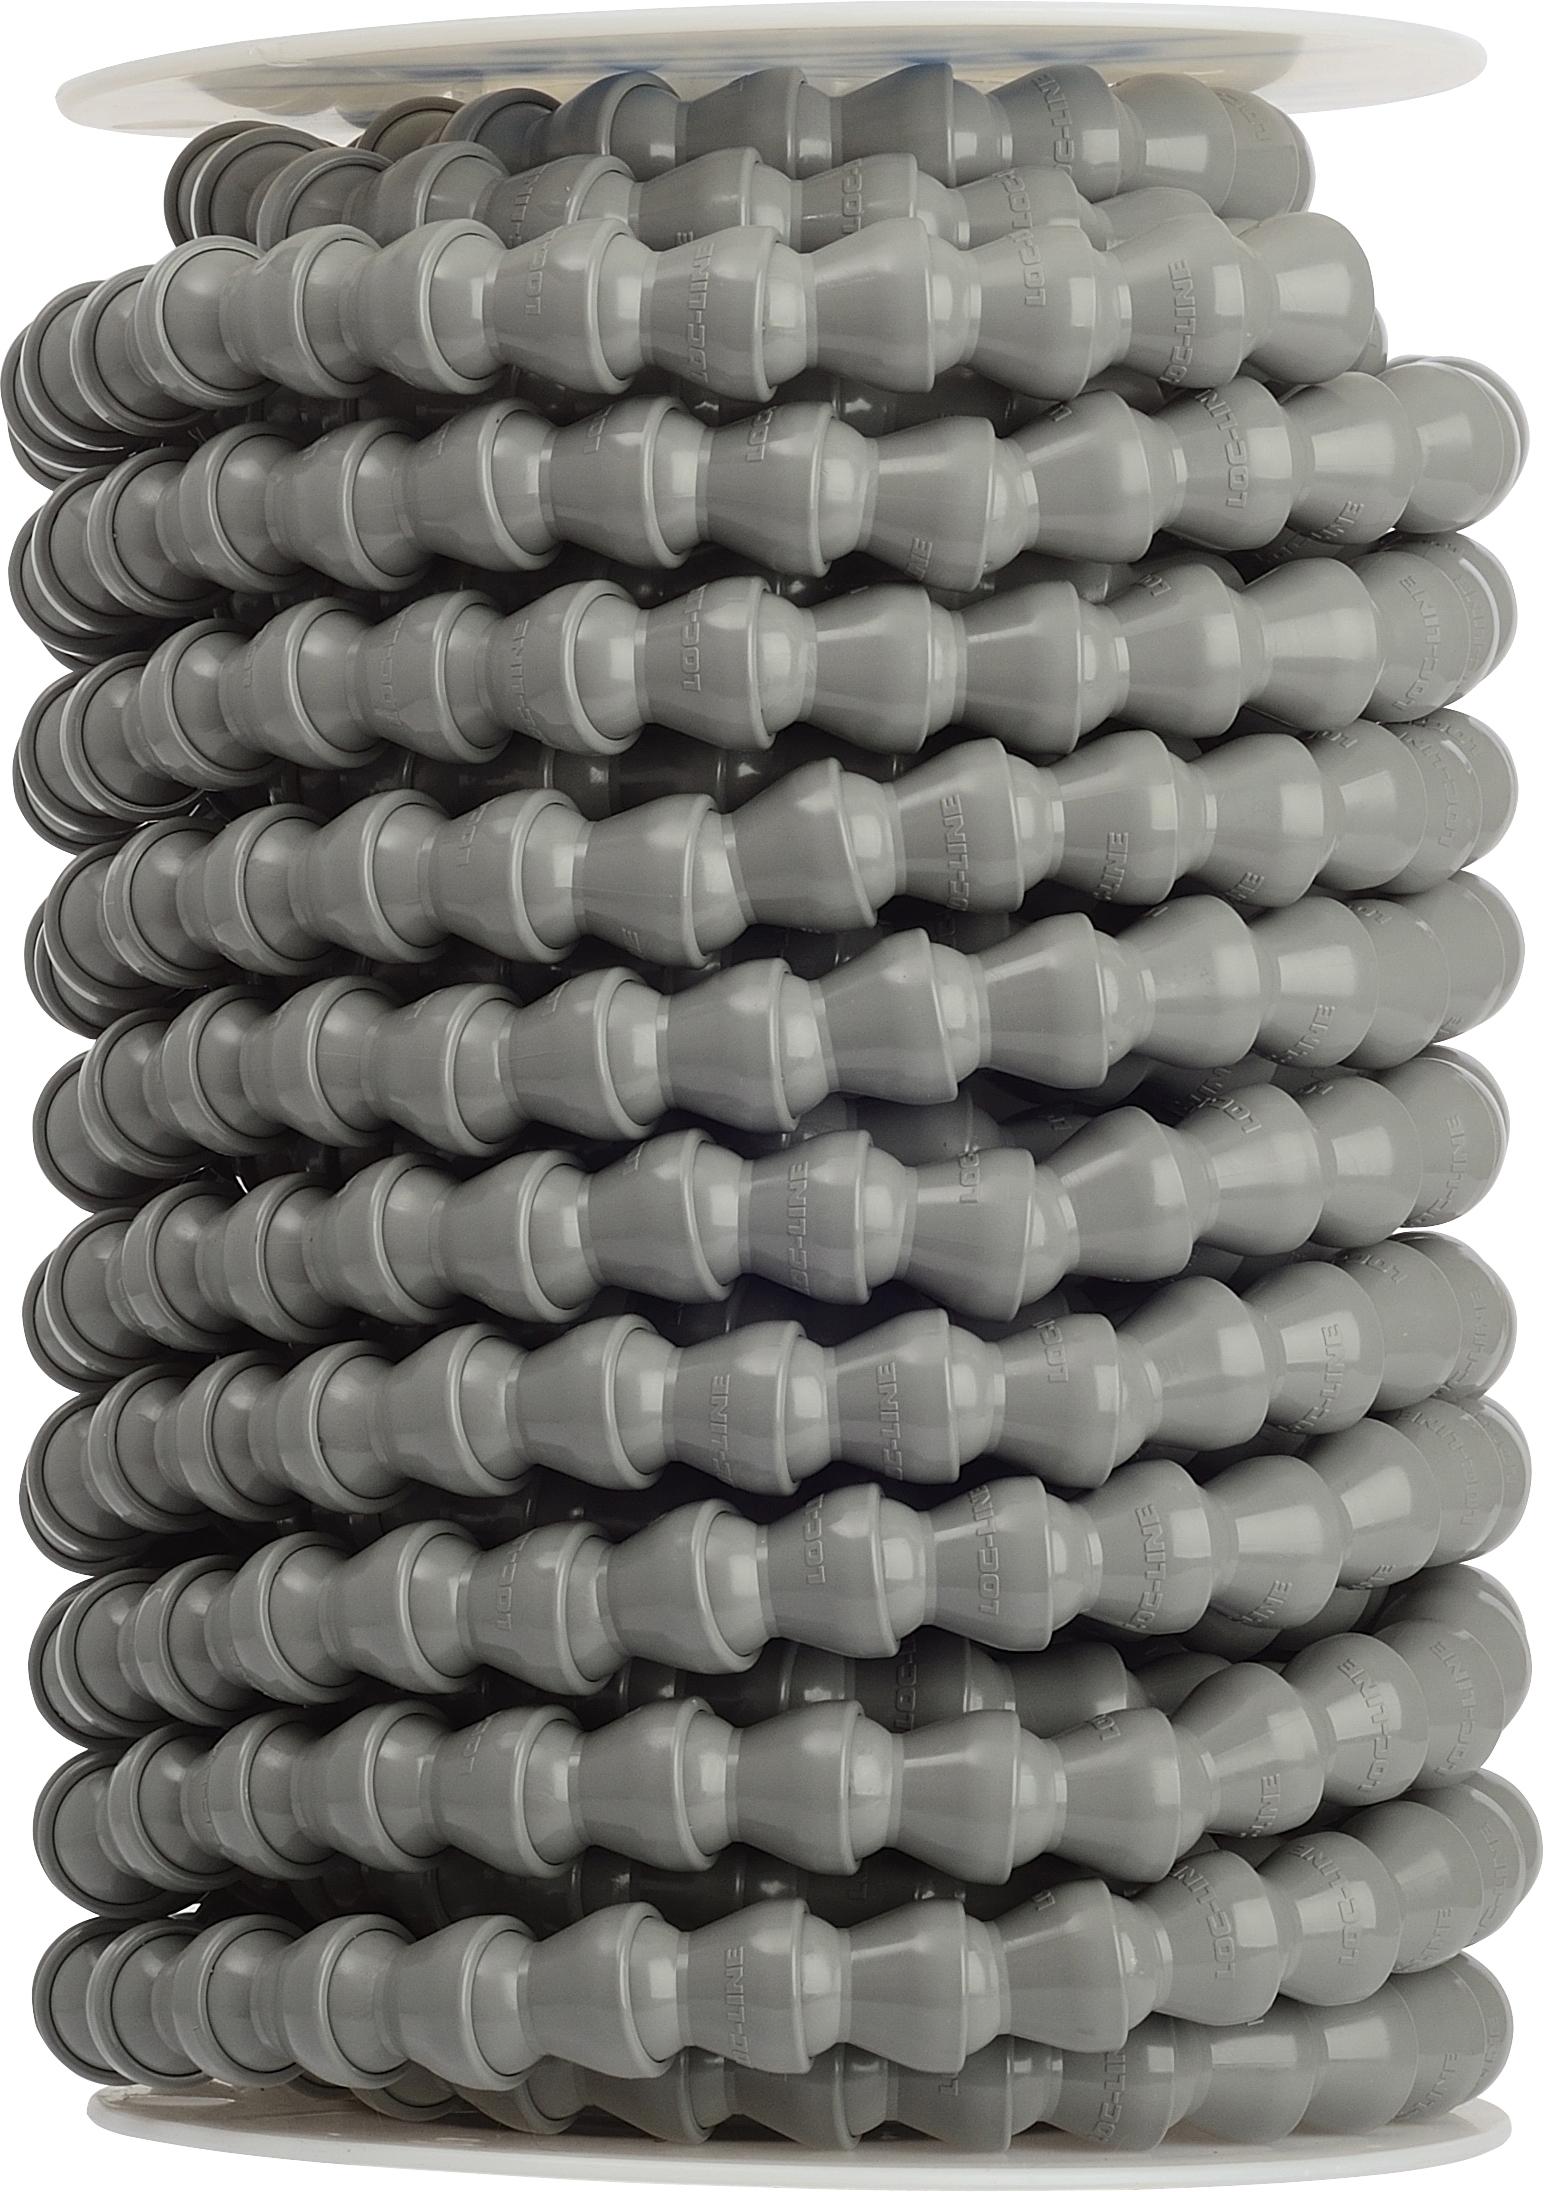 Acetal Copolymer 50 Length 1//2 Hose ID Loc-Line Coolant Hose Component Segment Coil